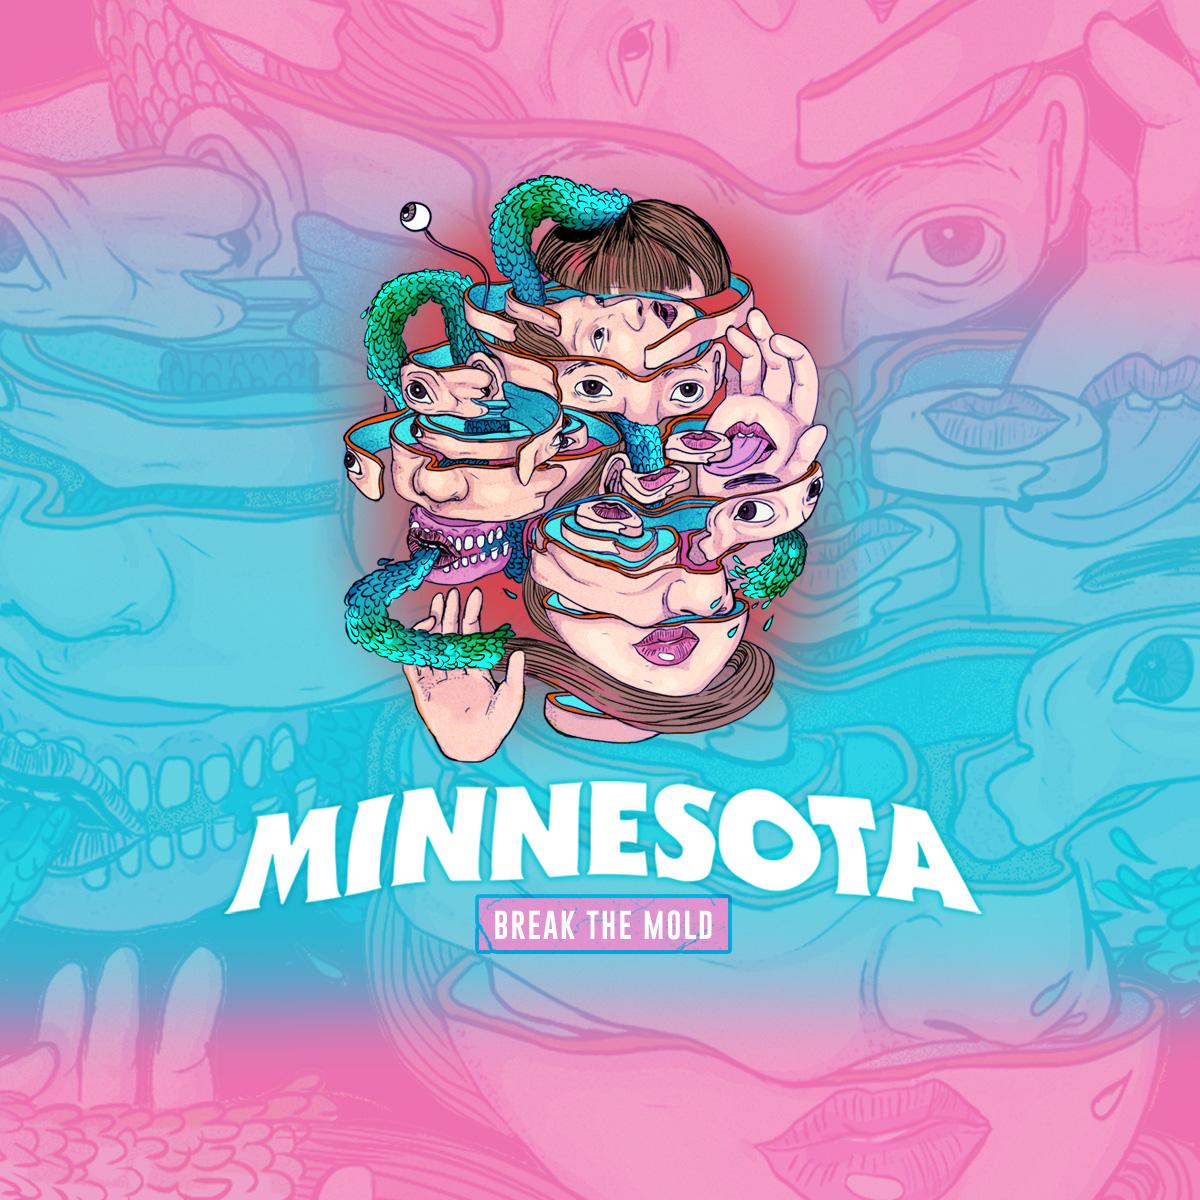 Minnesota: Main Image